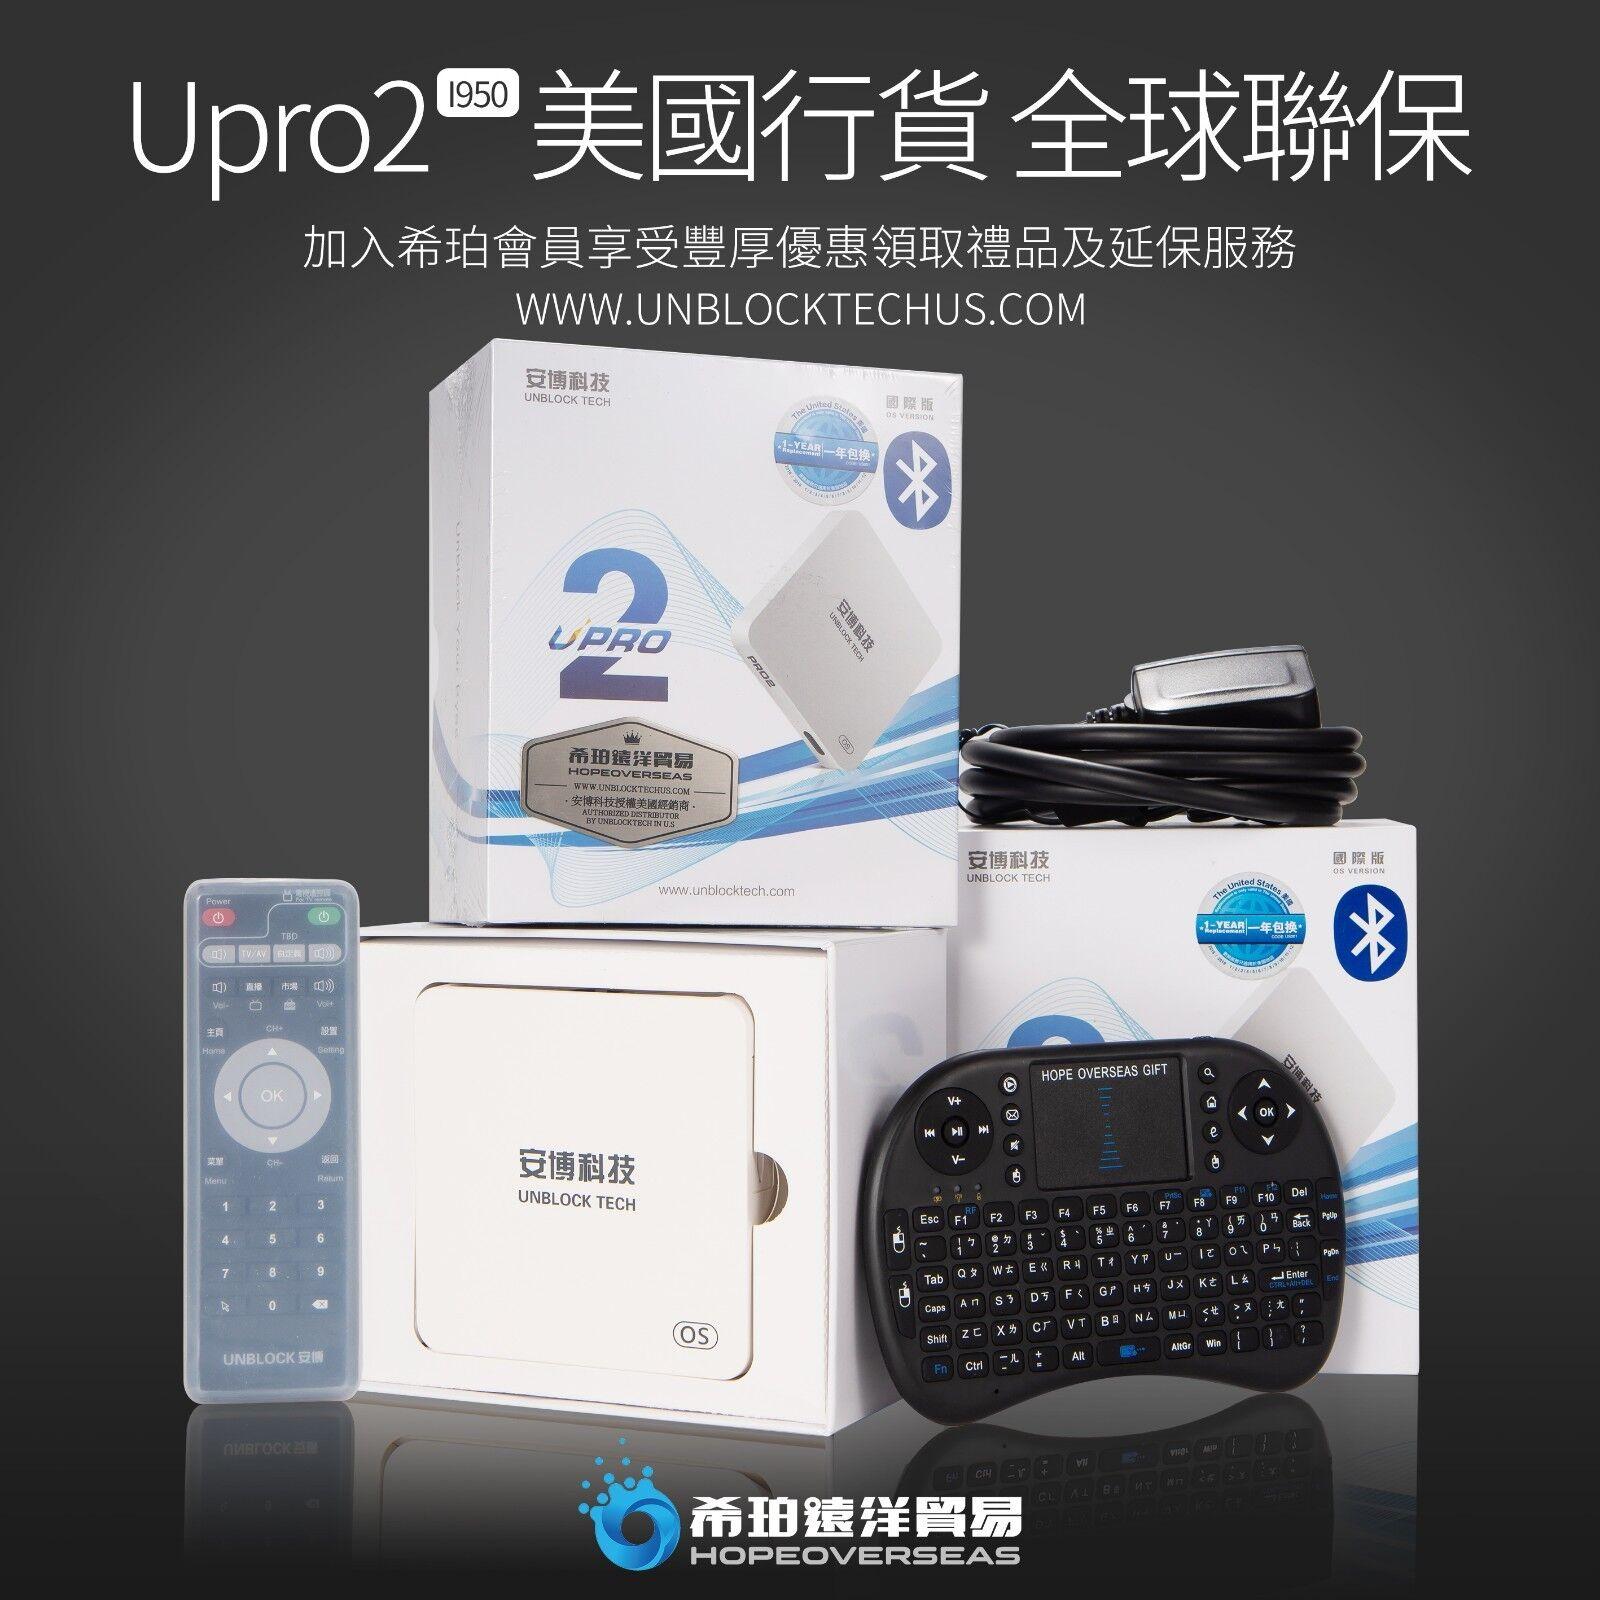 s-l1600 安博盒子六代 希珀遠洋美国行货 Unblock Tech Hopeoverseas UPRO2 UBOX6 OS ver I950 Gen6 TV Box